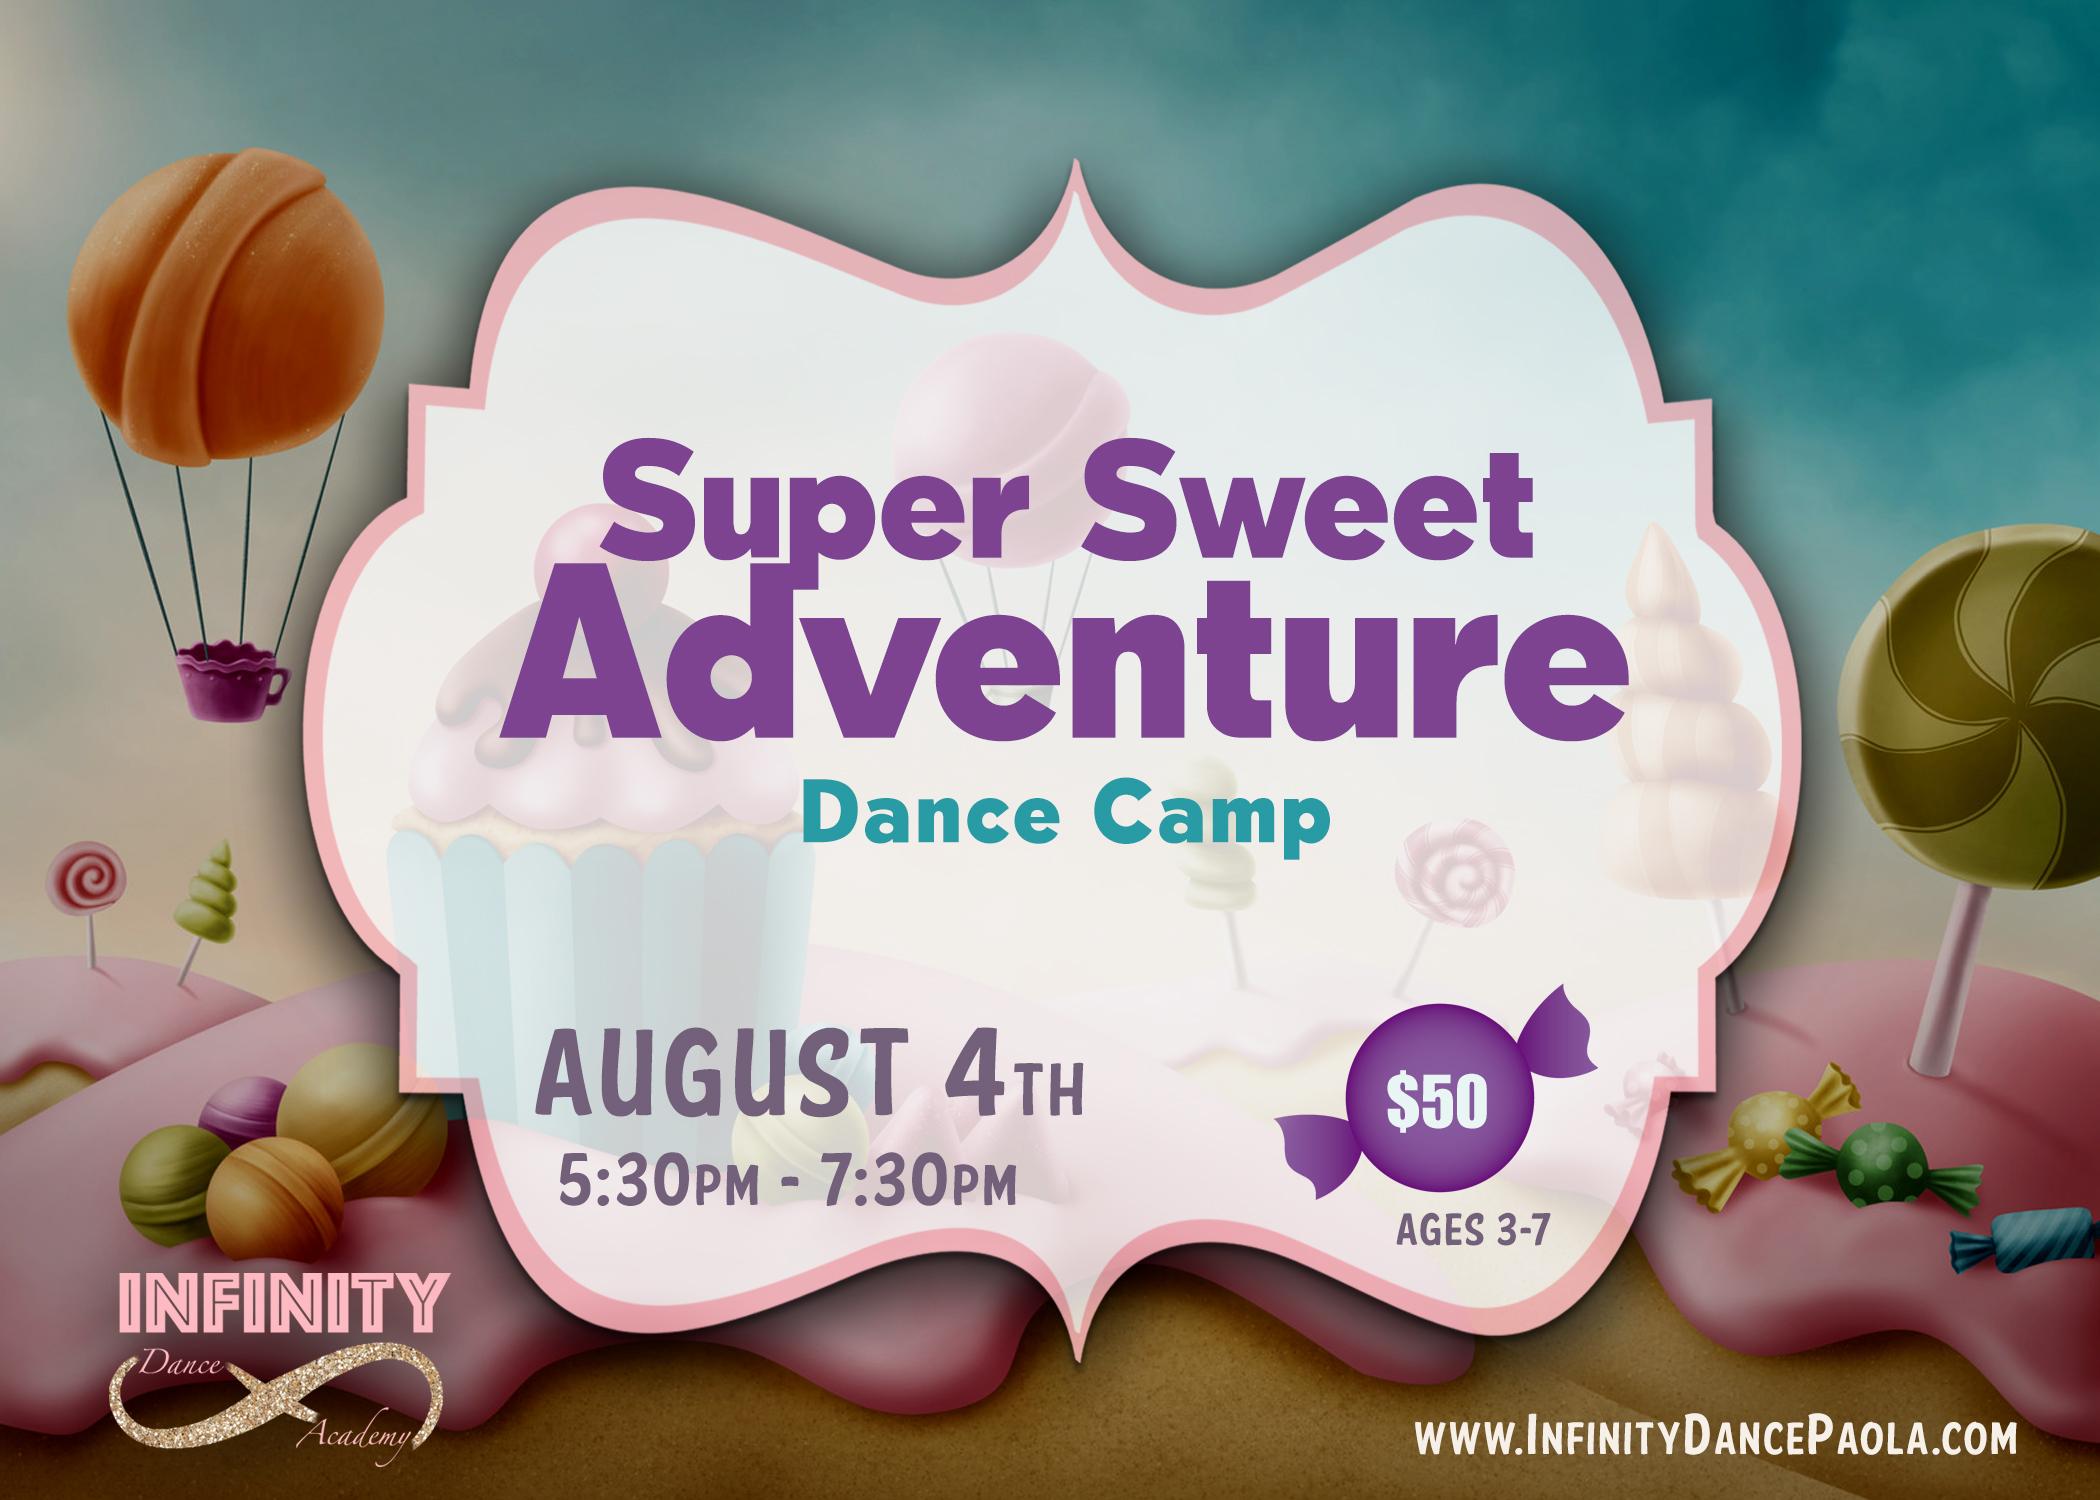 Super Sweet Adventure